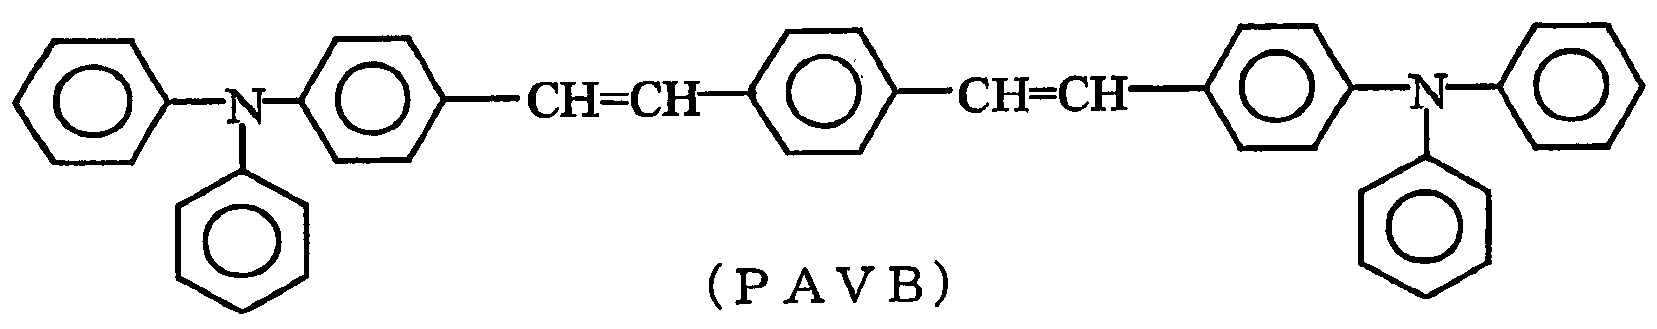 Figure 112001021532154-pct00053